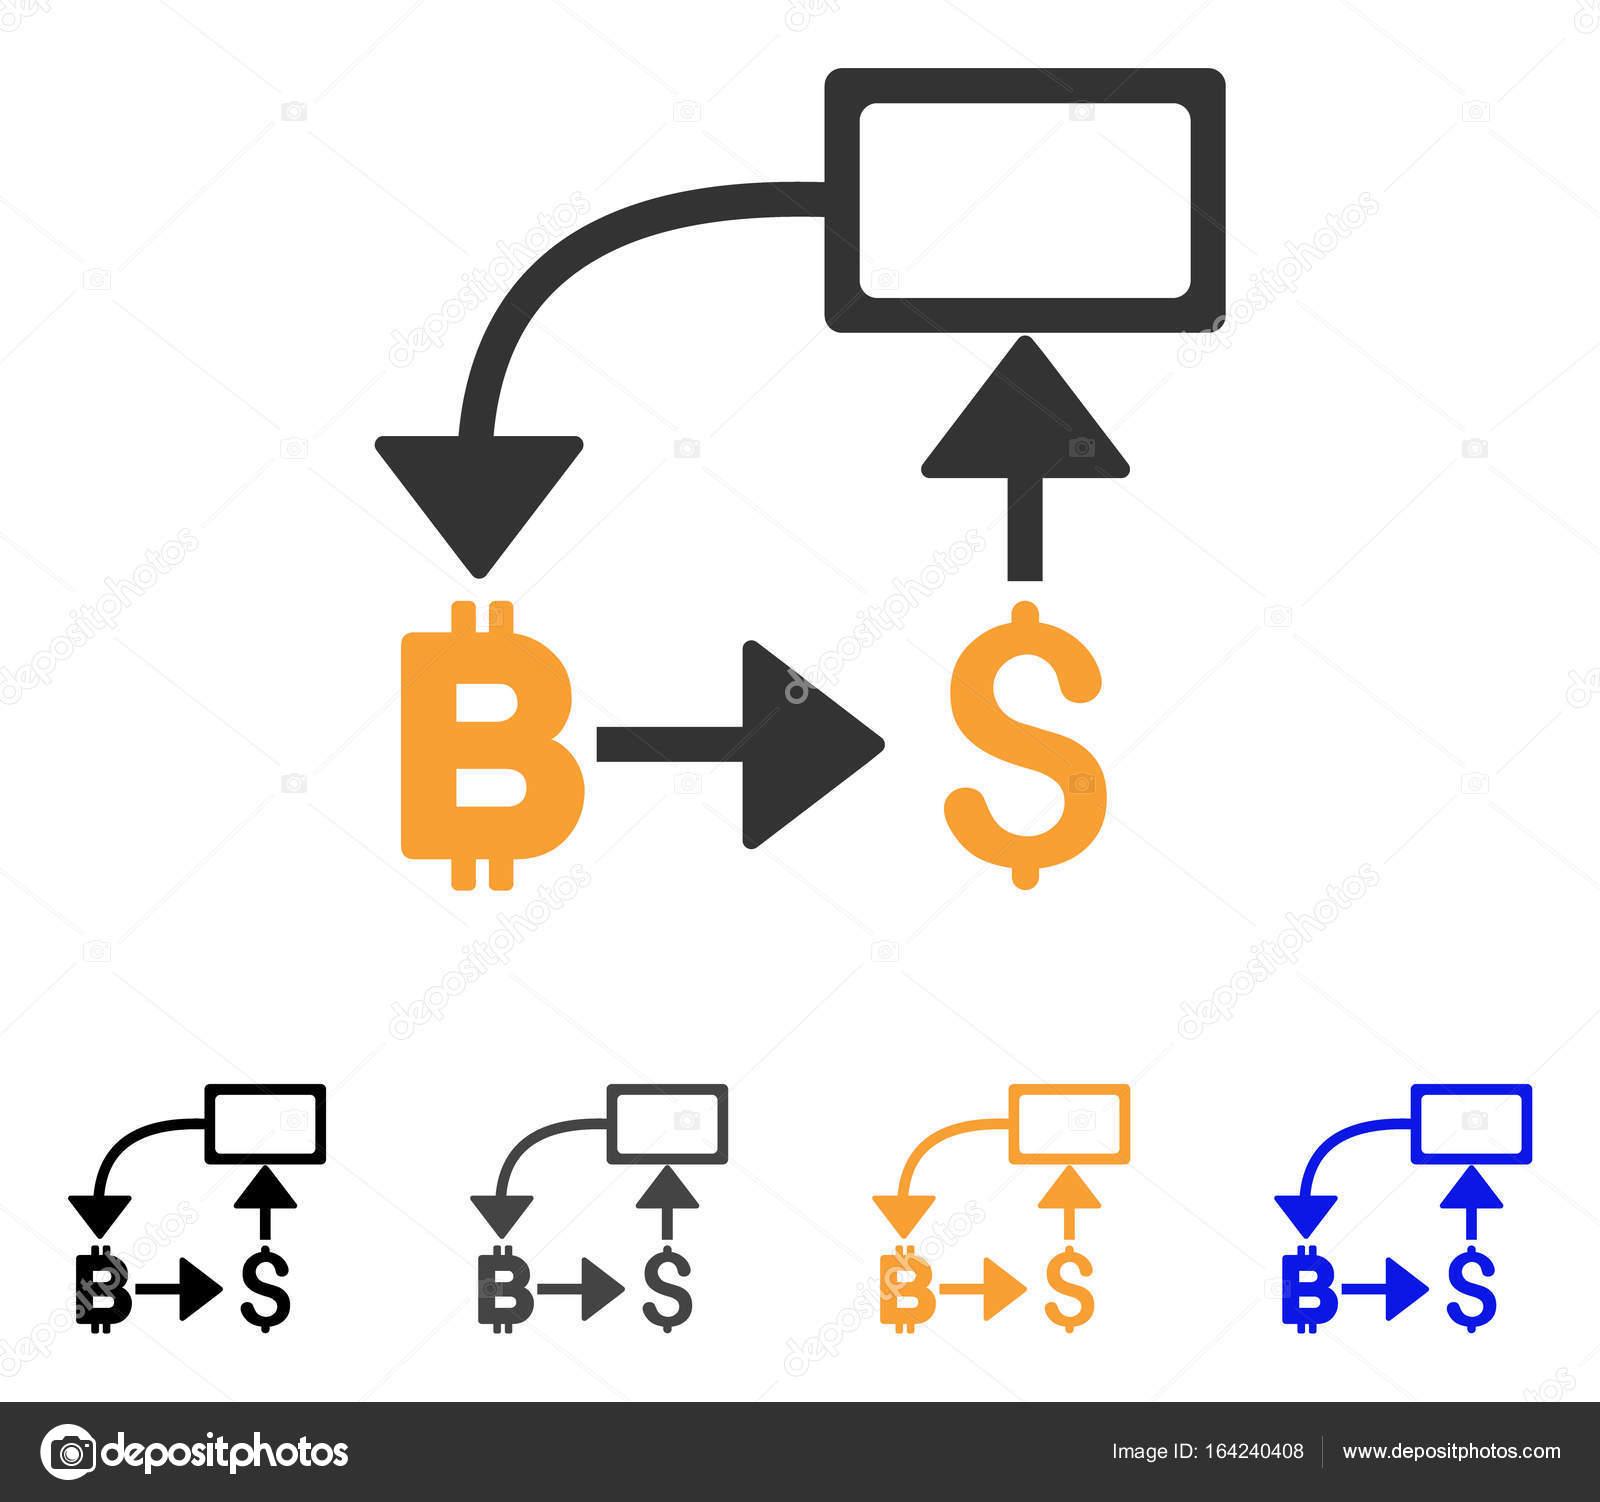 Bitcoin árfolyam (BTC) - Napiábudapestapartment.co.hu